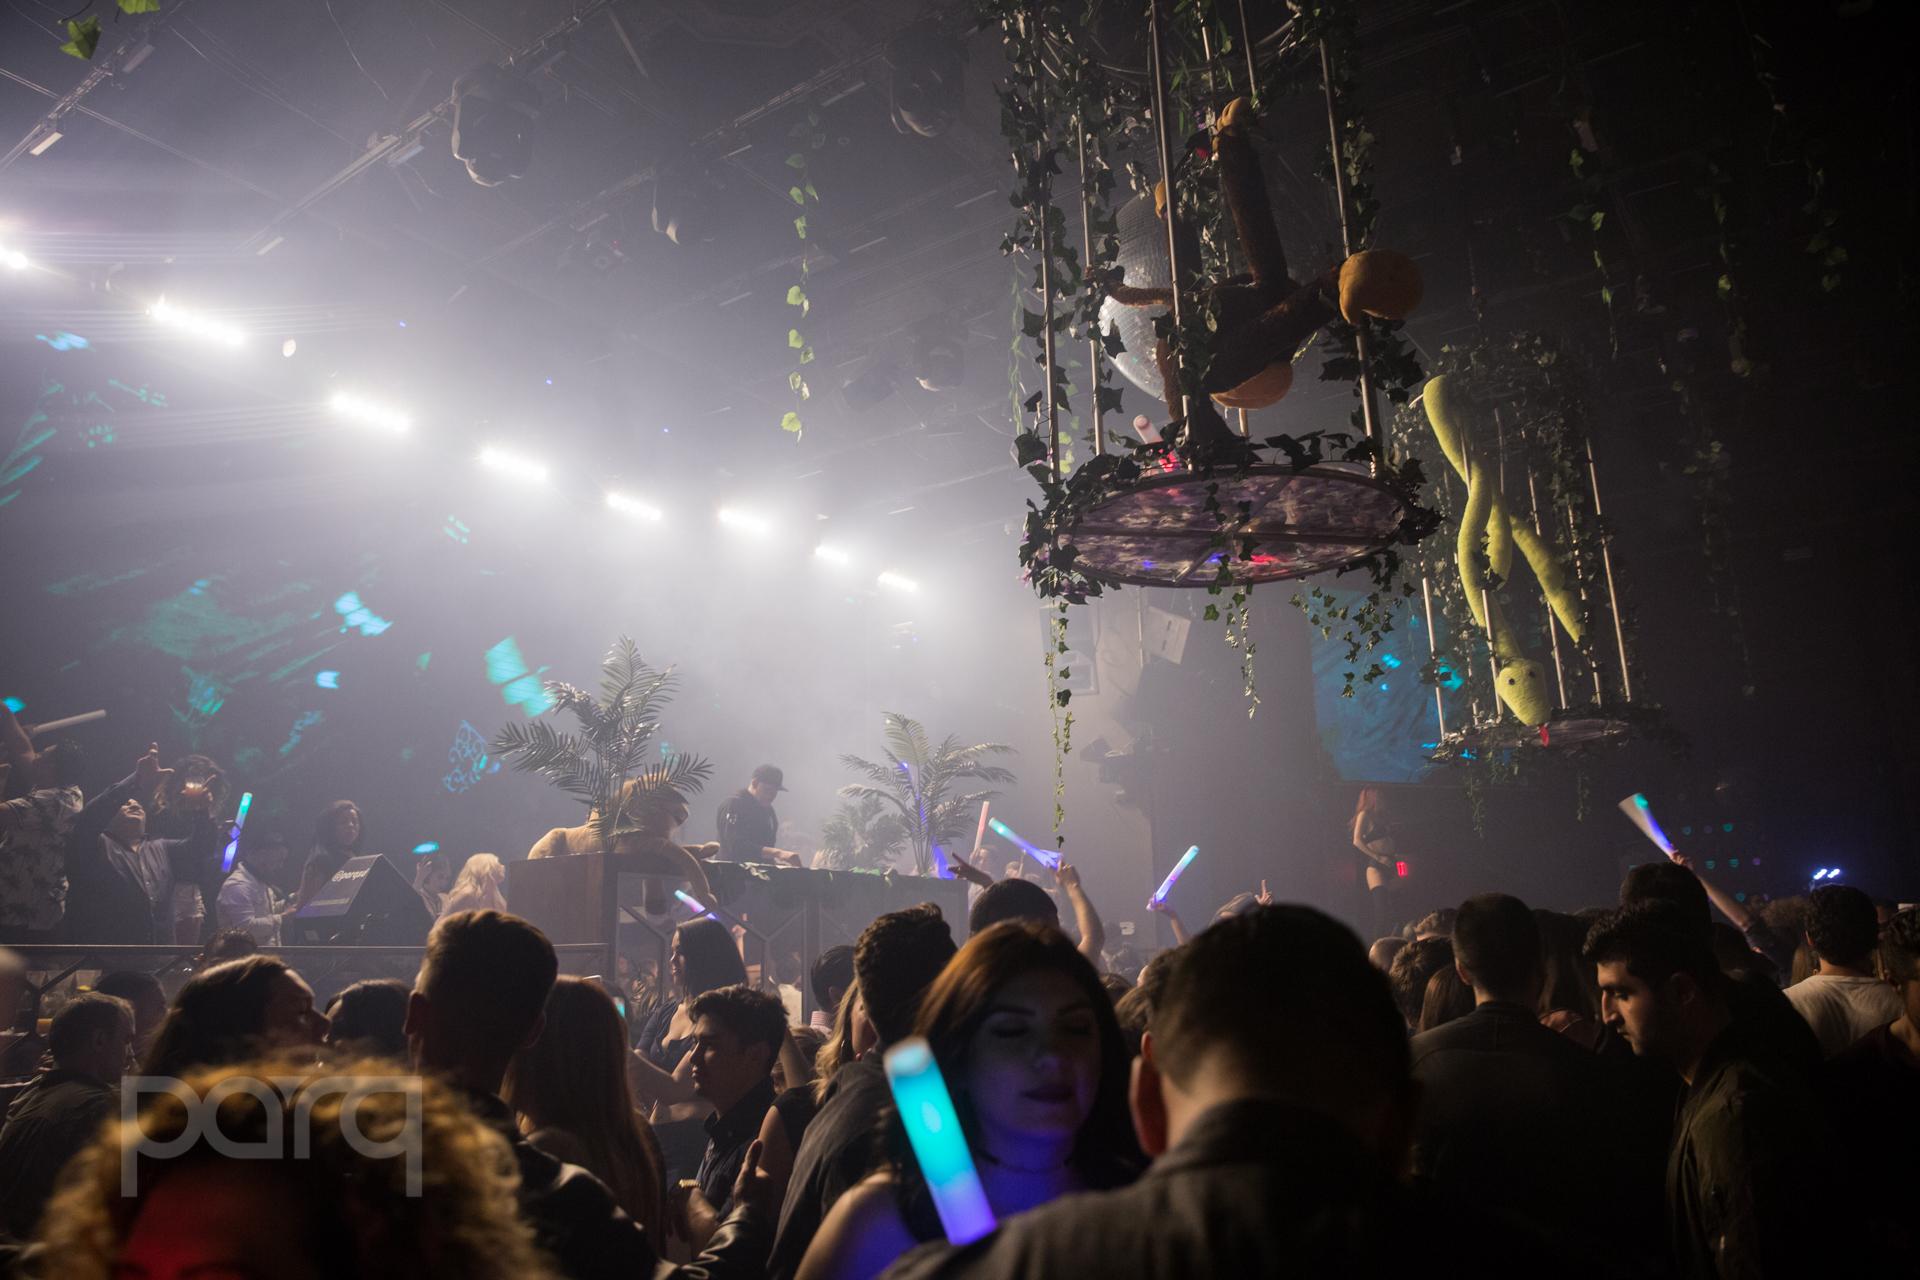 San-Diego-Nightclub-Zoo Funktion-46.jpg